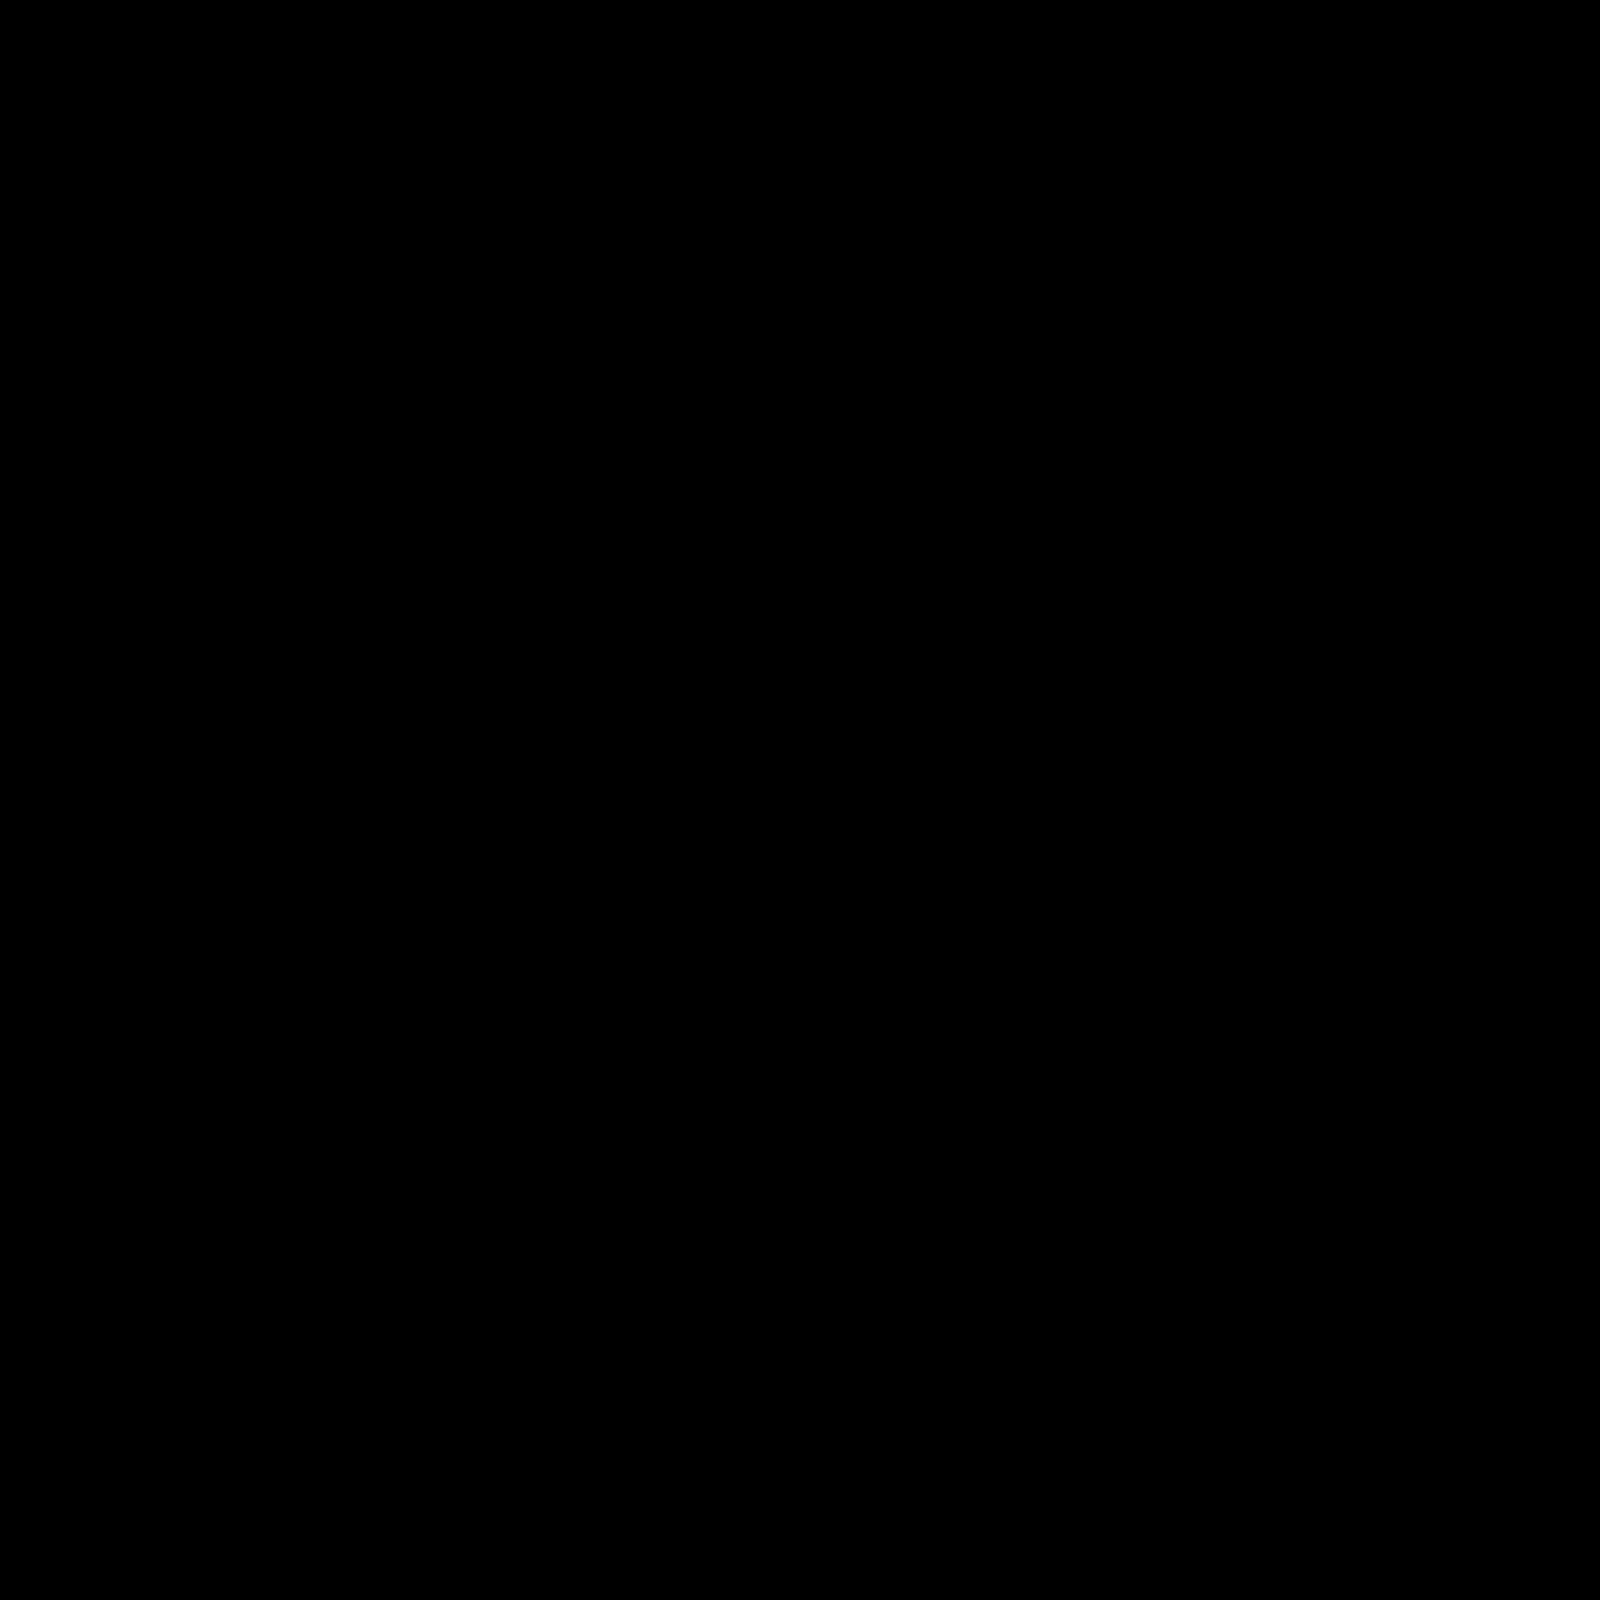 Czasopismo icon